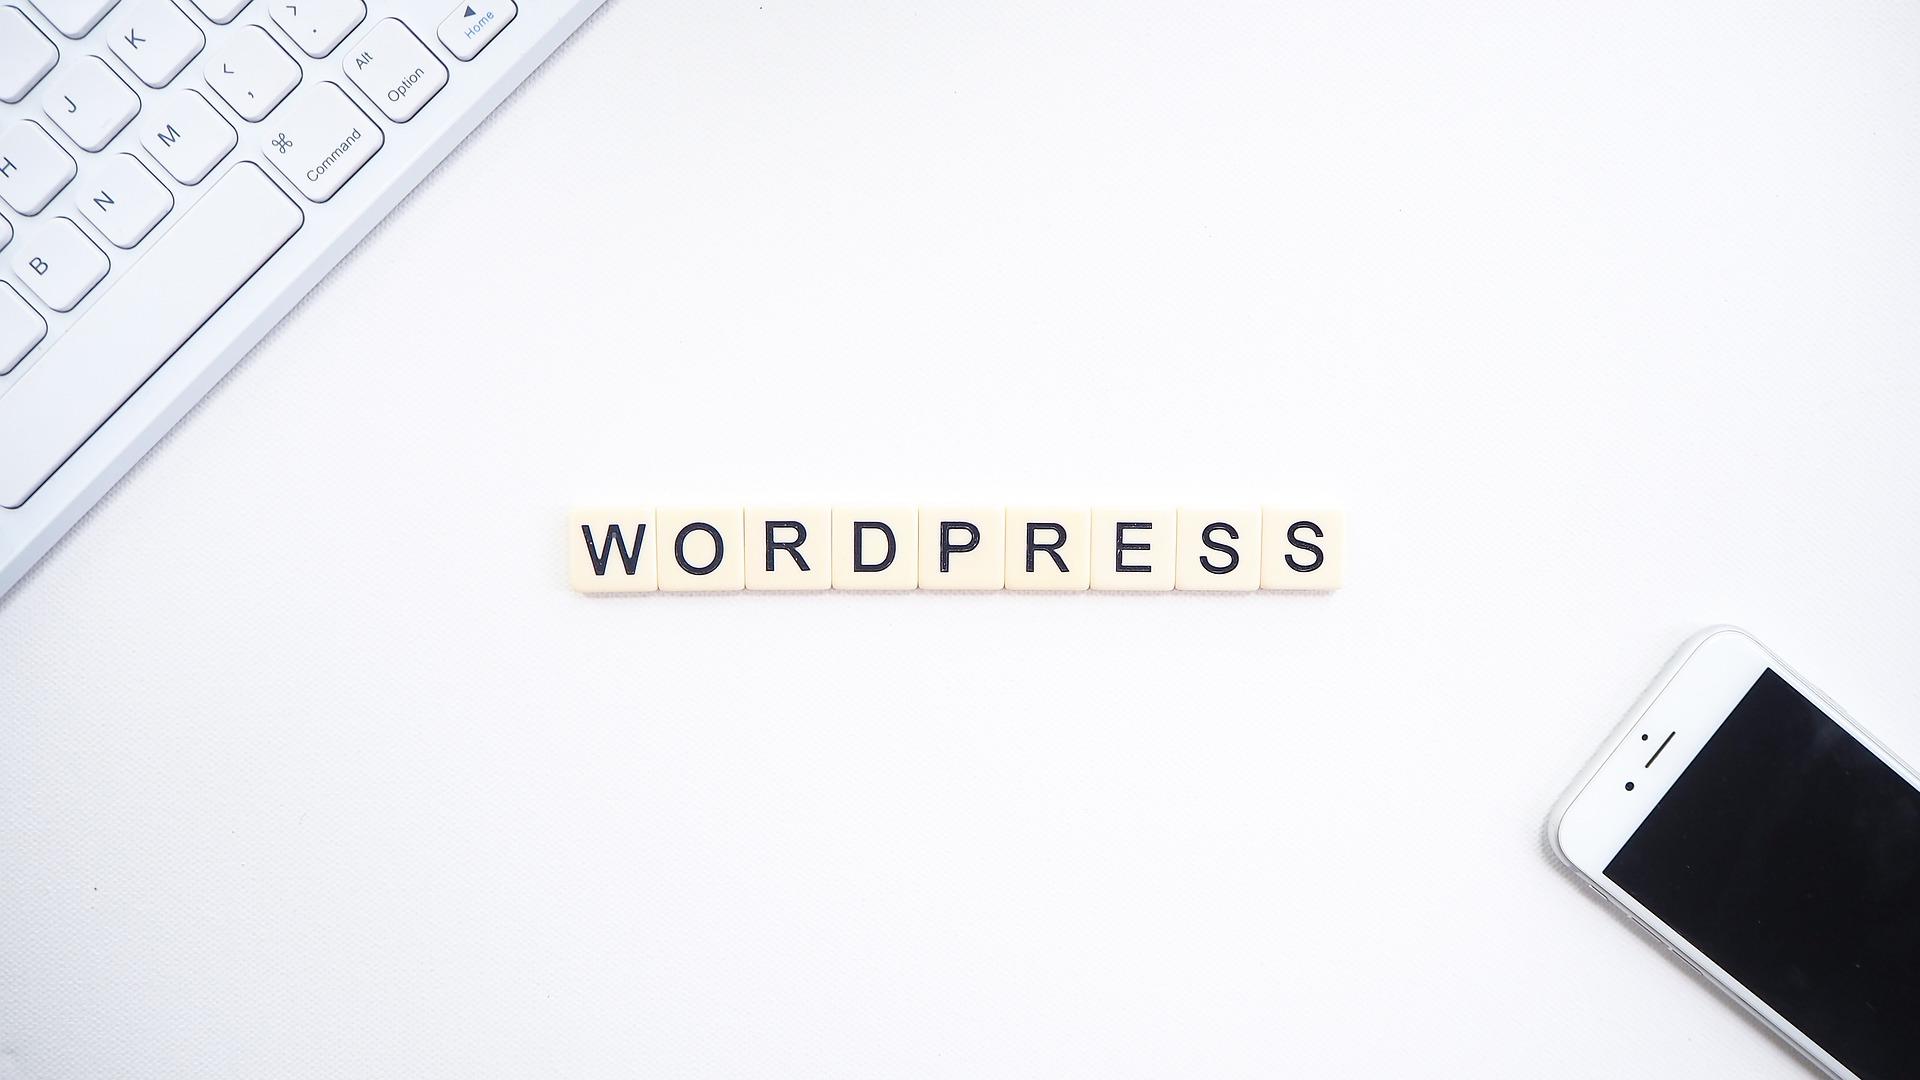 WordPressを使う